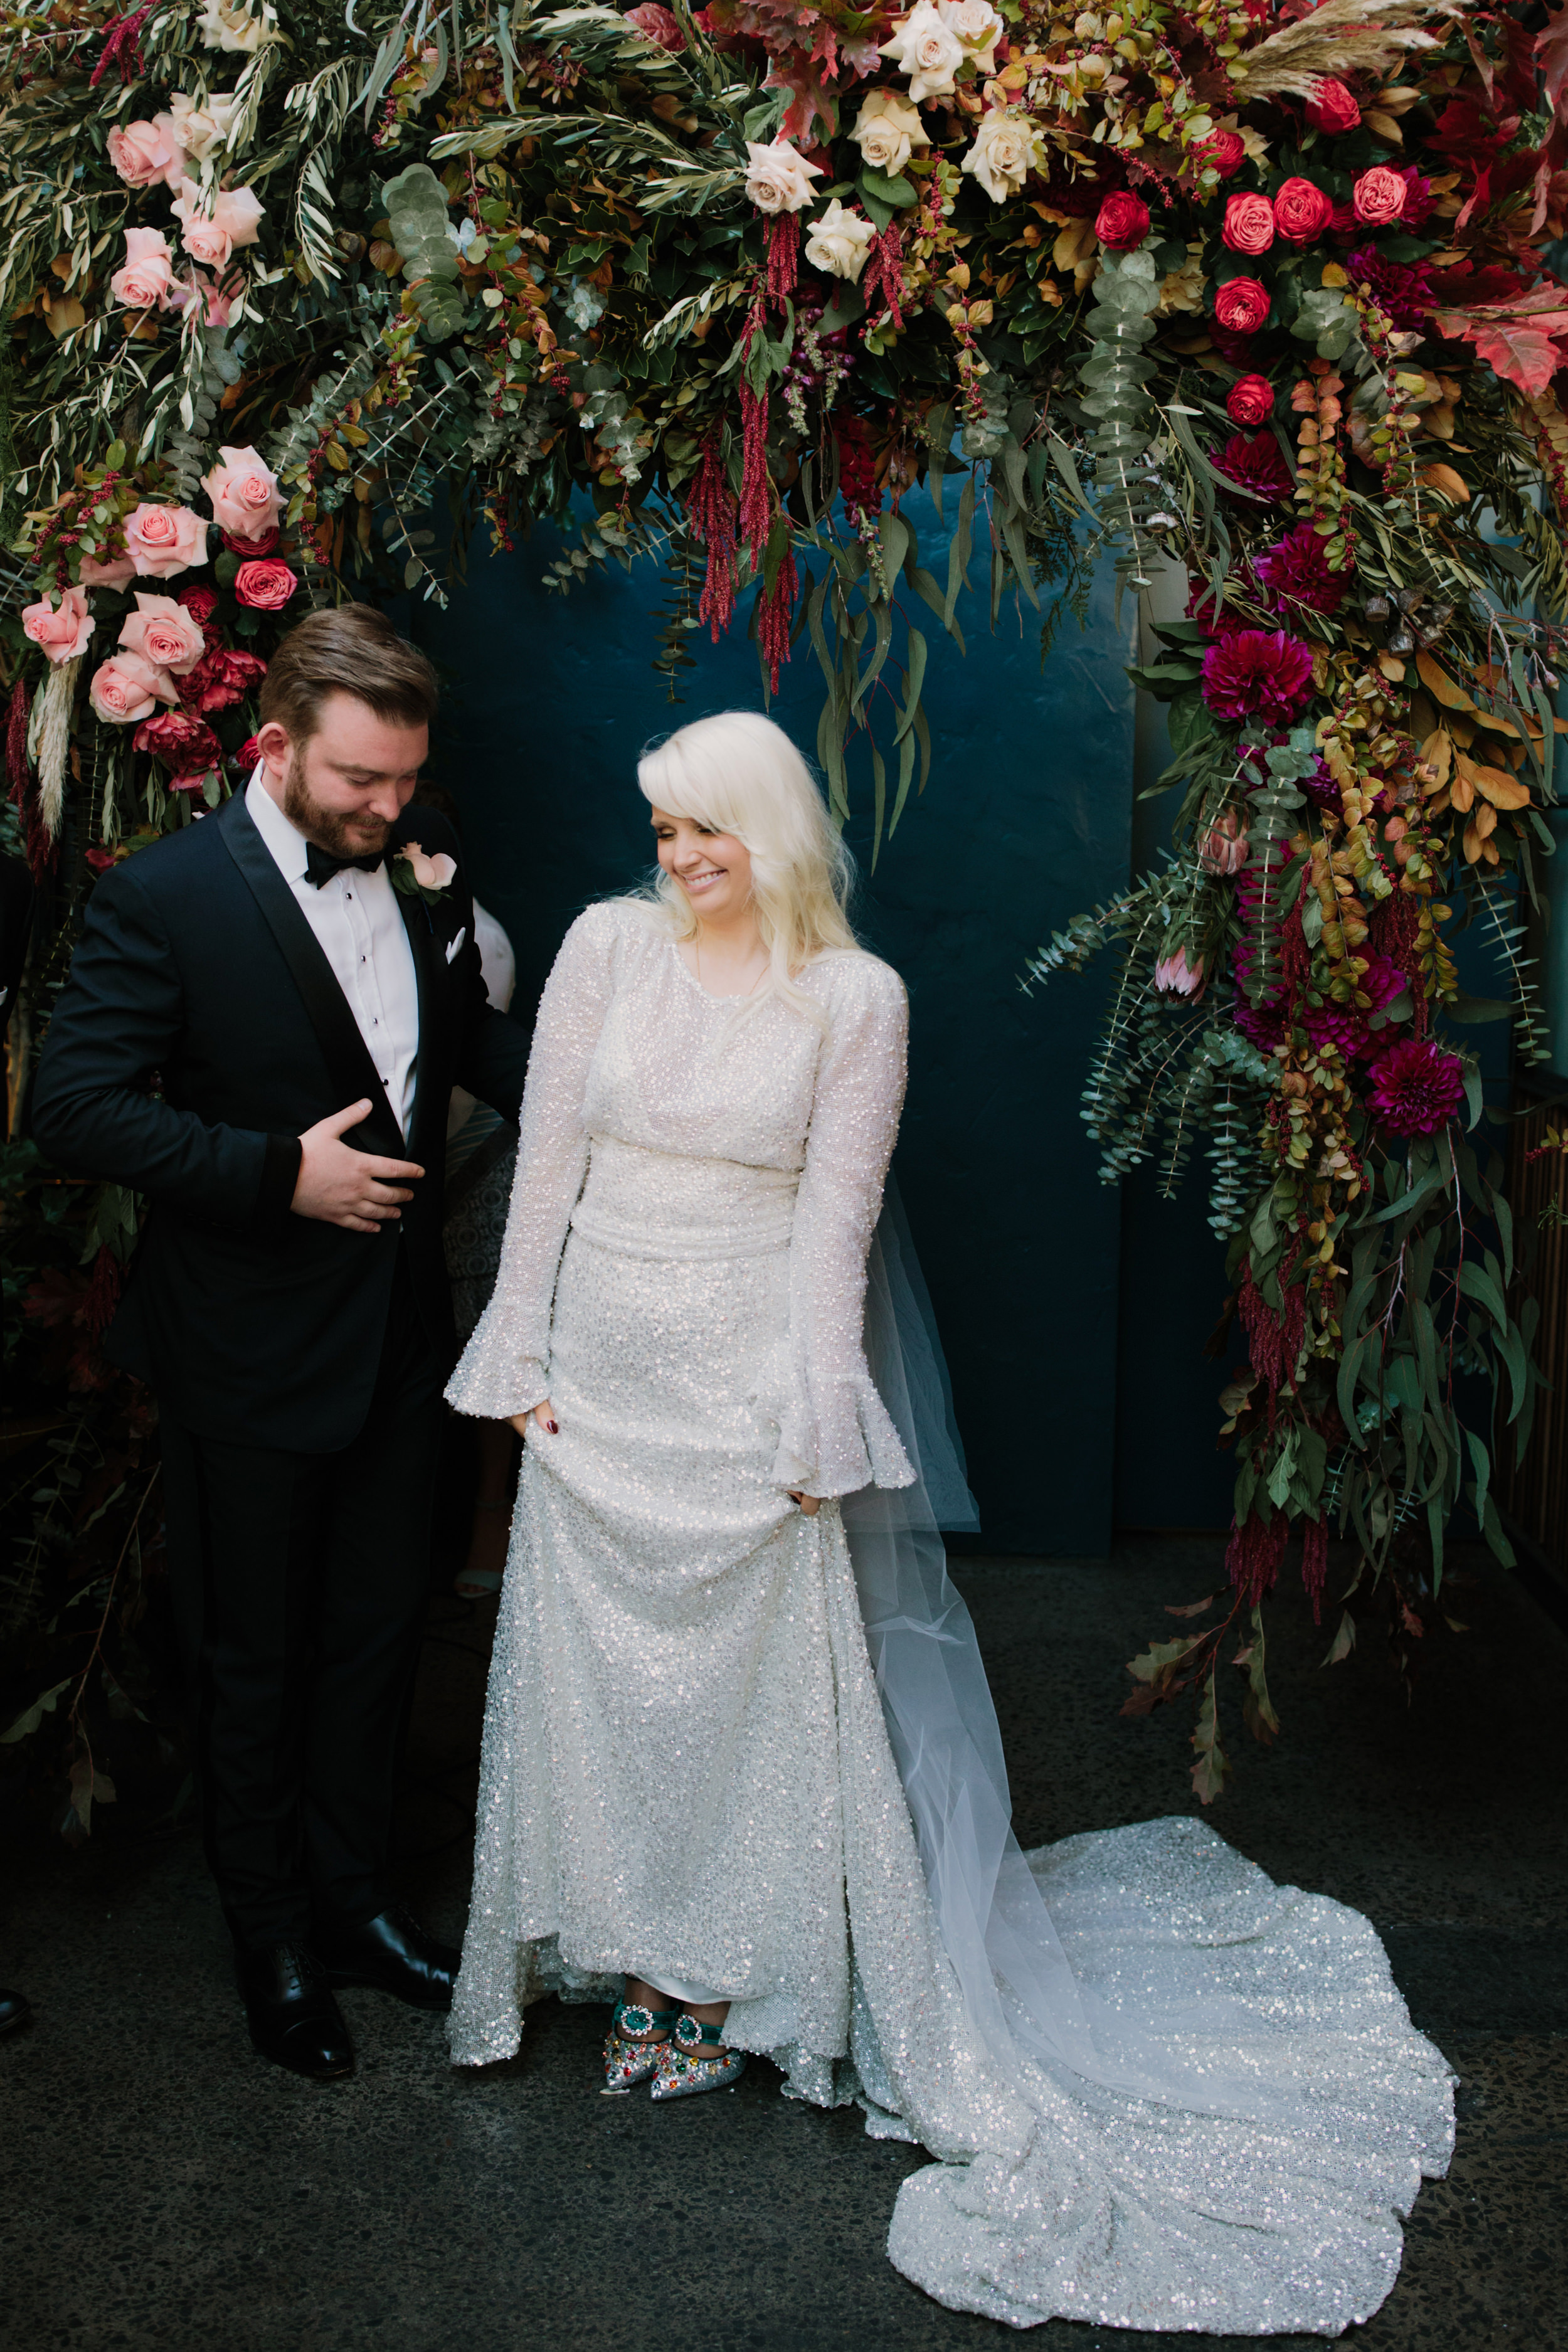 I-Got-You-Babe-Weddings-Tori-Will-Rupert0055.JPG